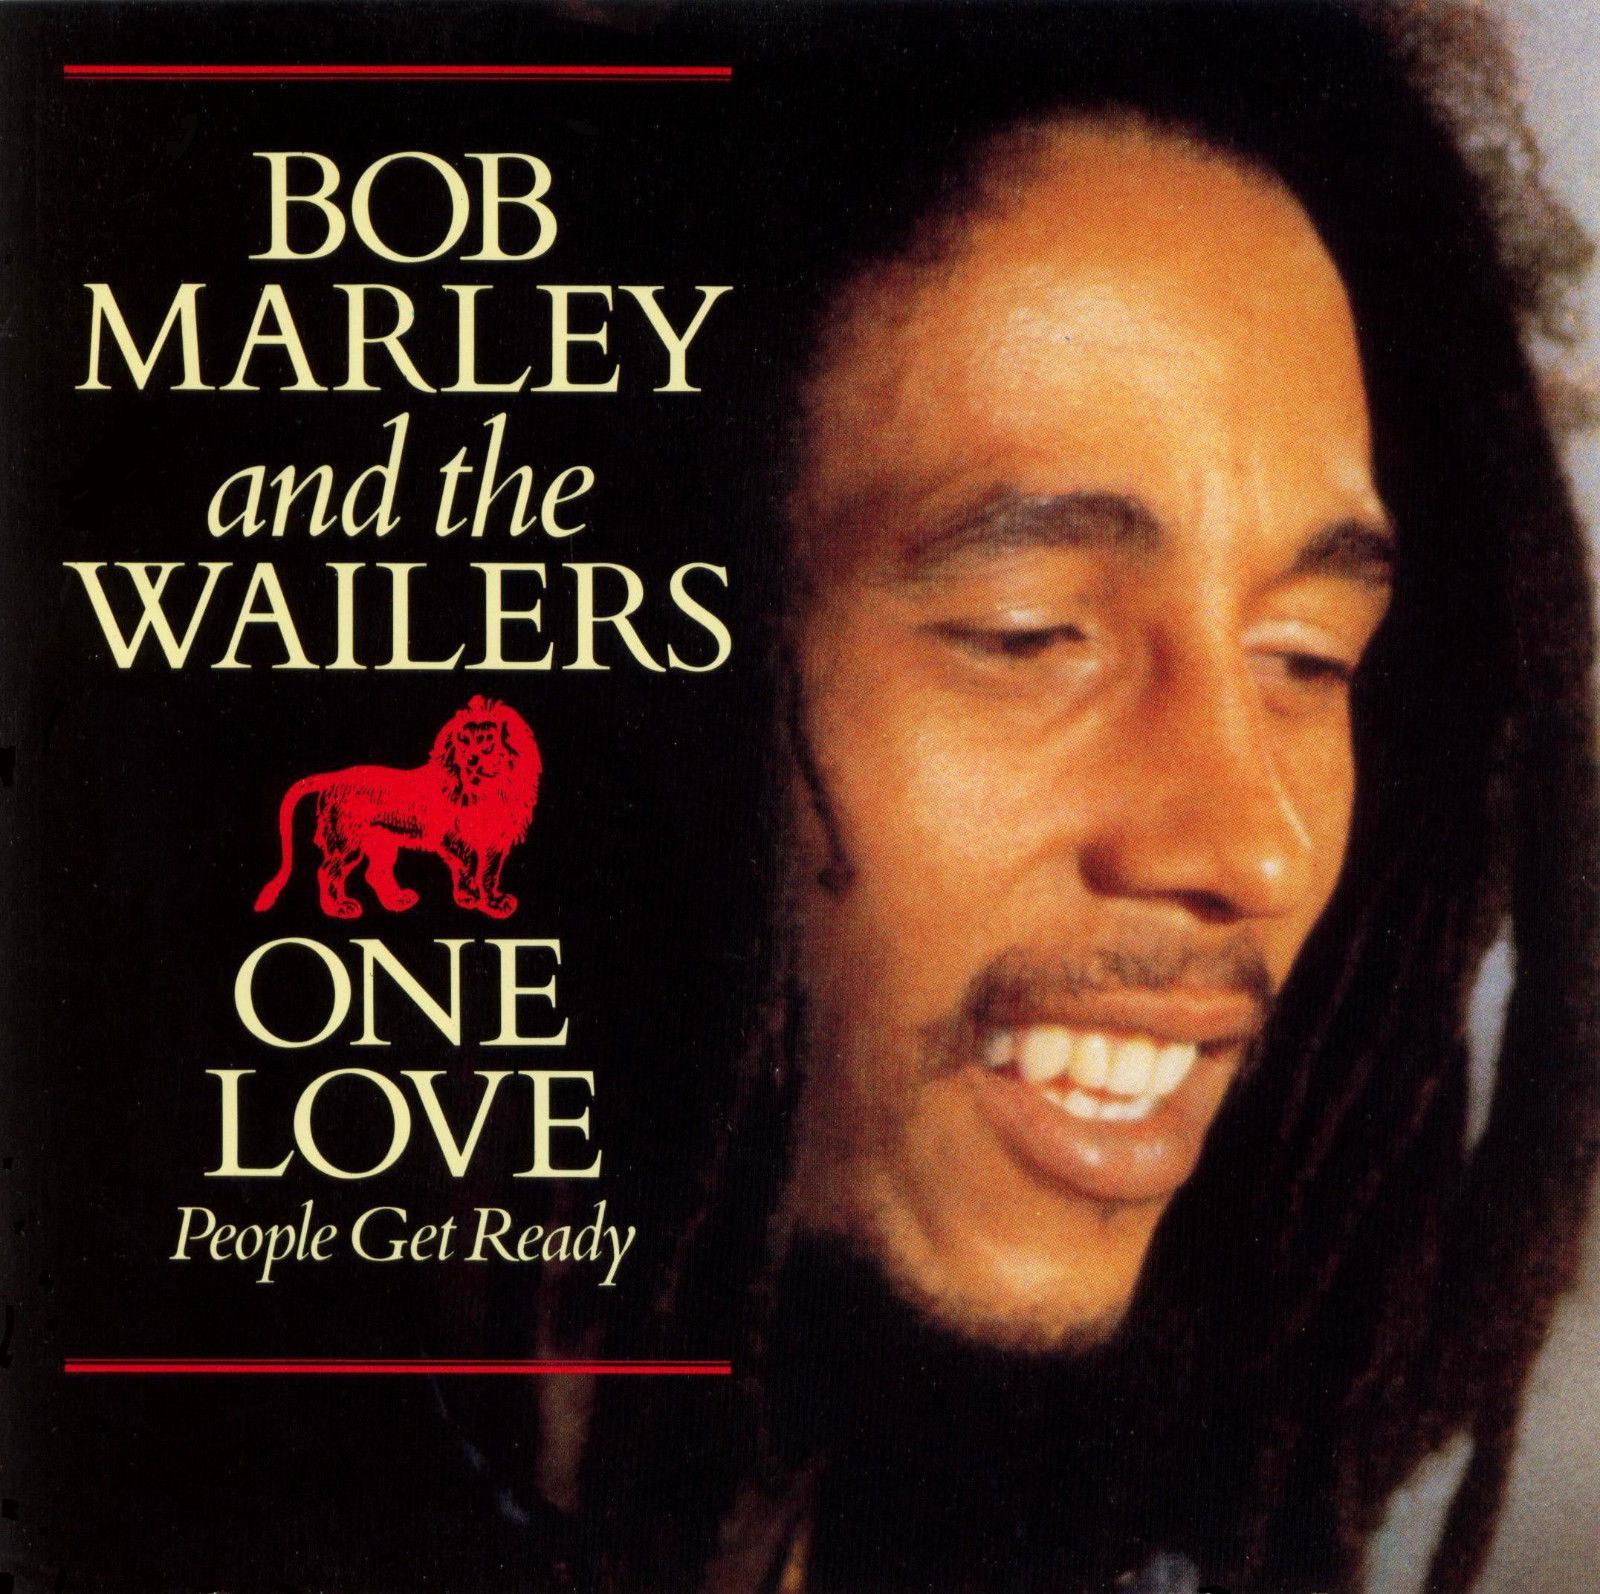 62288-BOB-MARLEY-ONE-LOVE-Wall-Print-Poster-Plakat